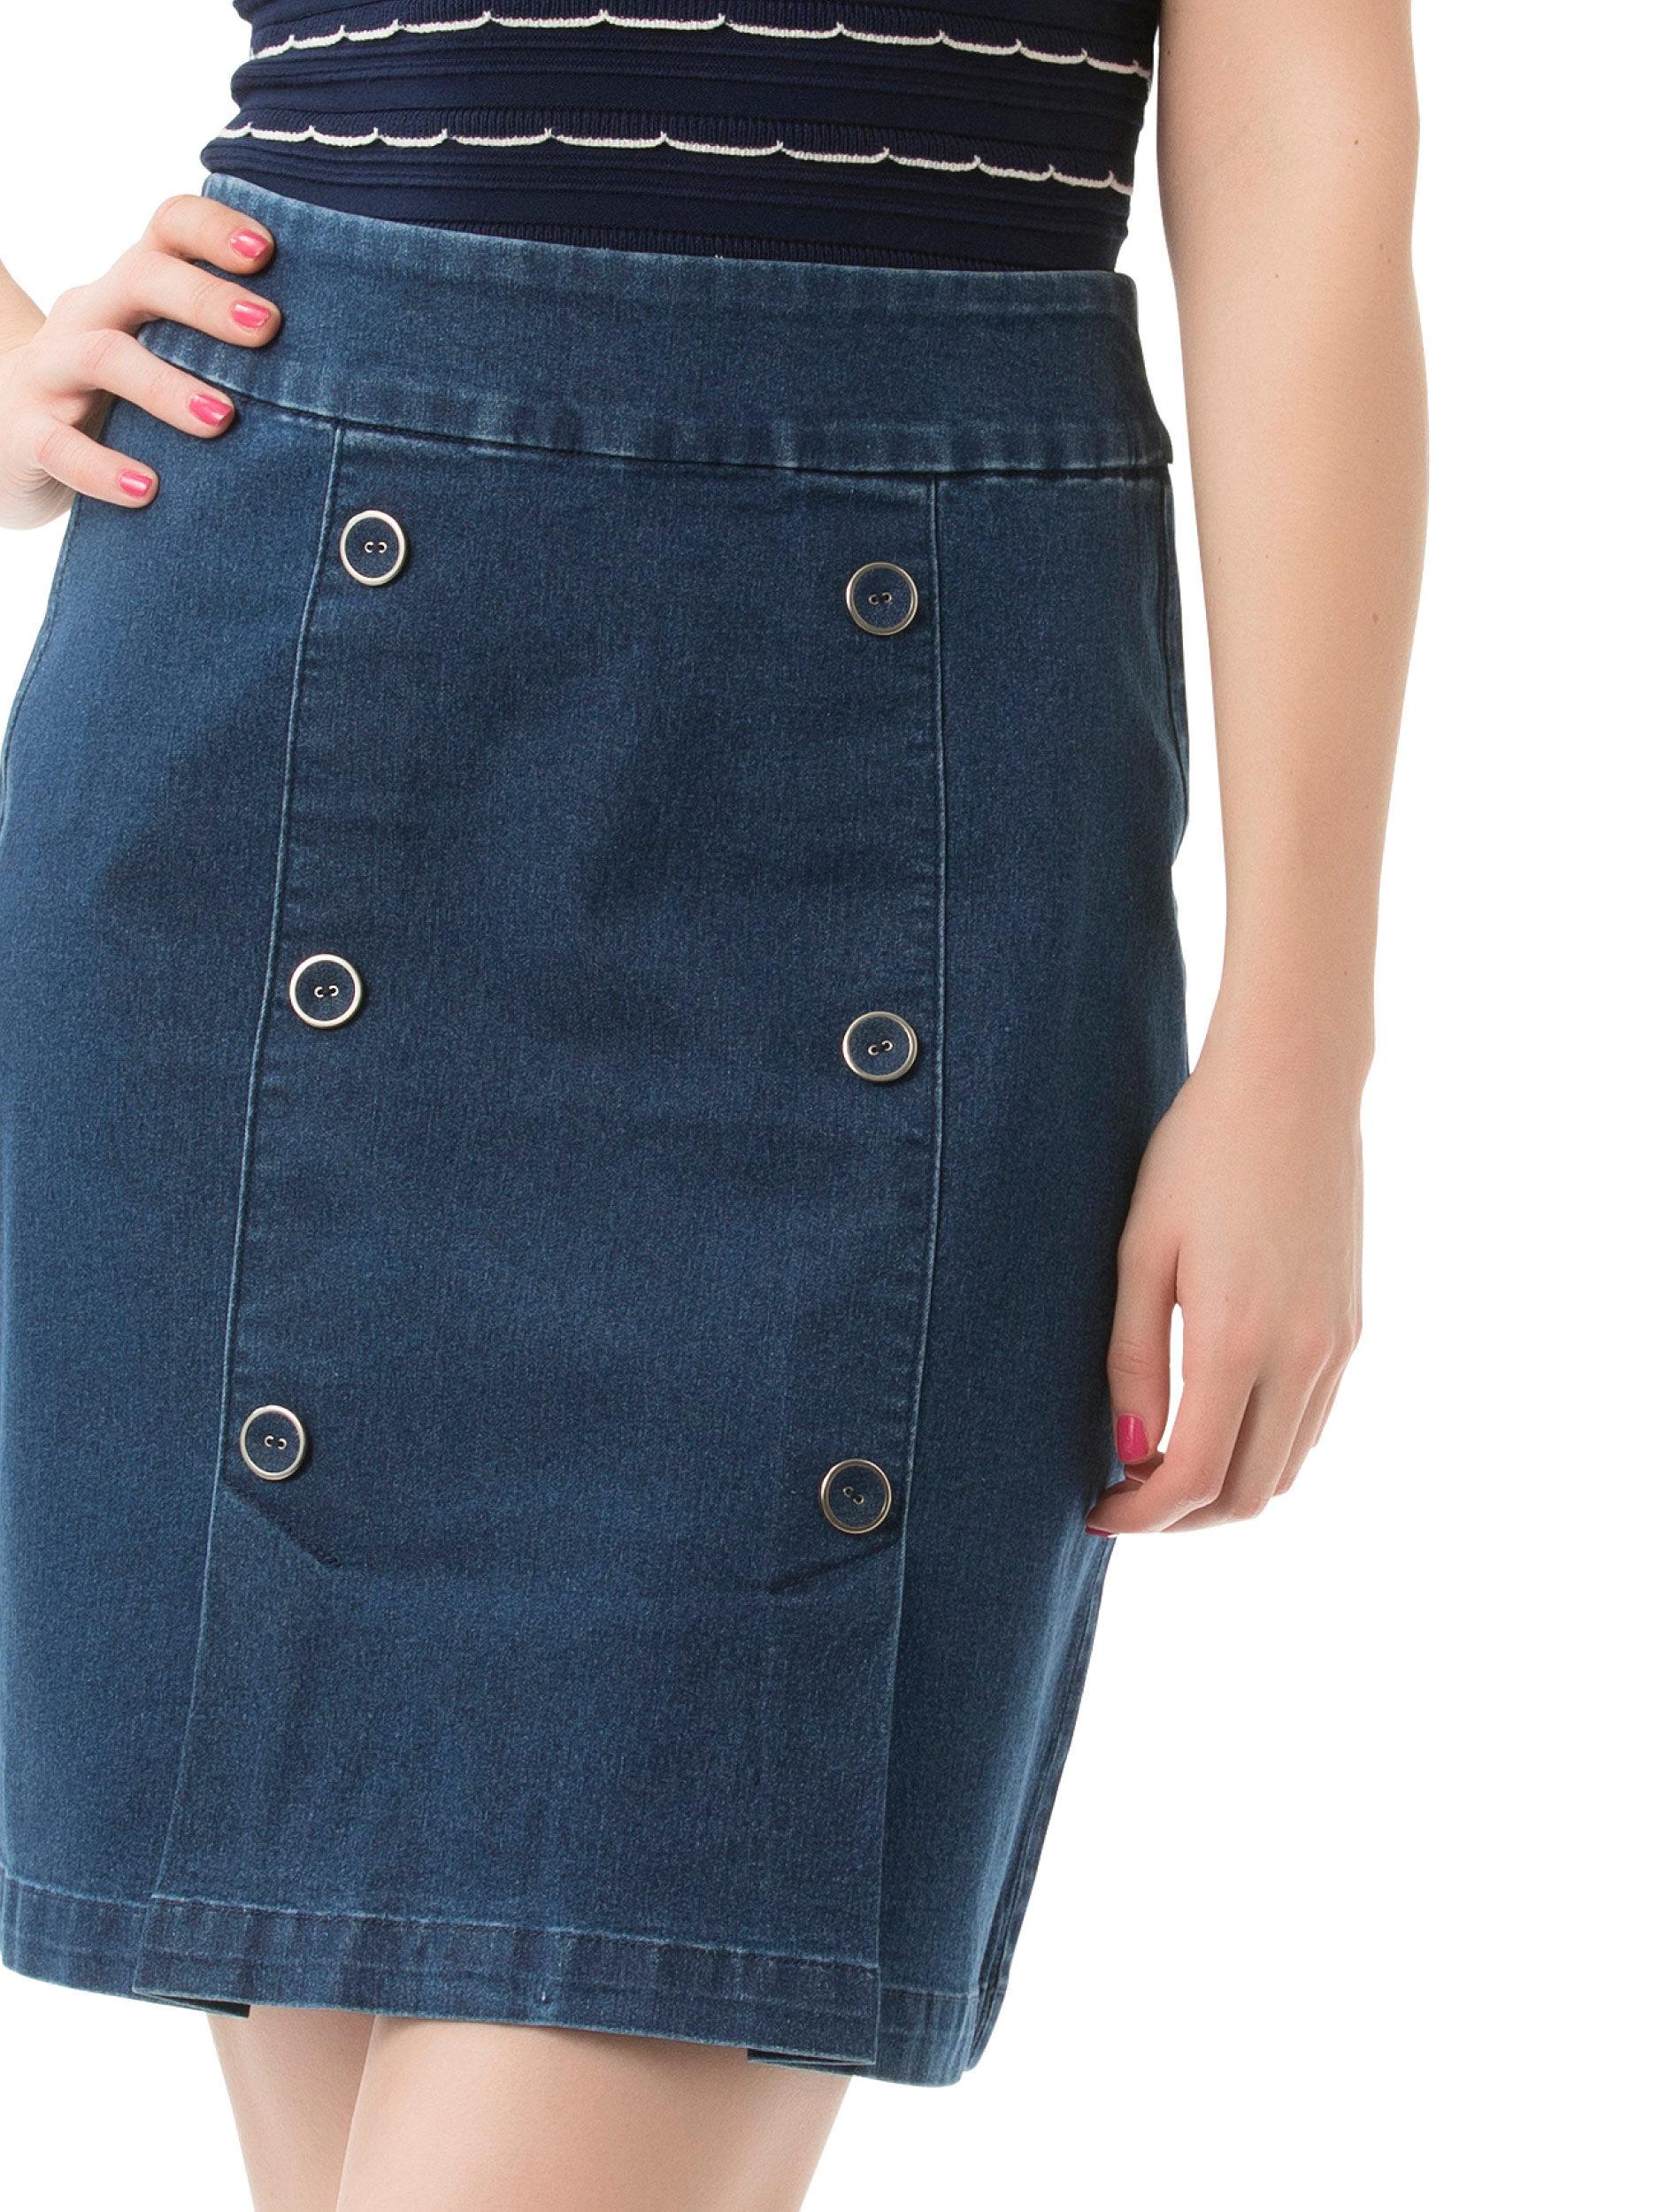 Rylie Denim Skirt